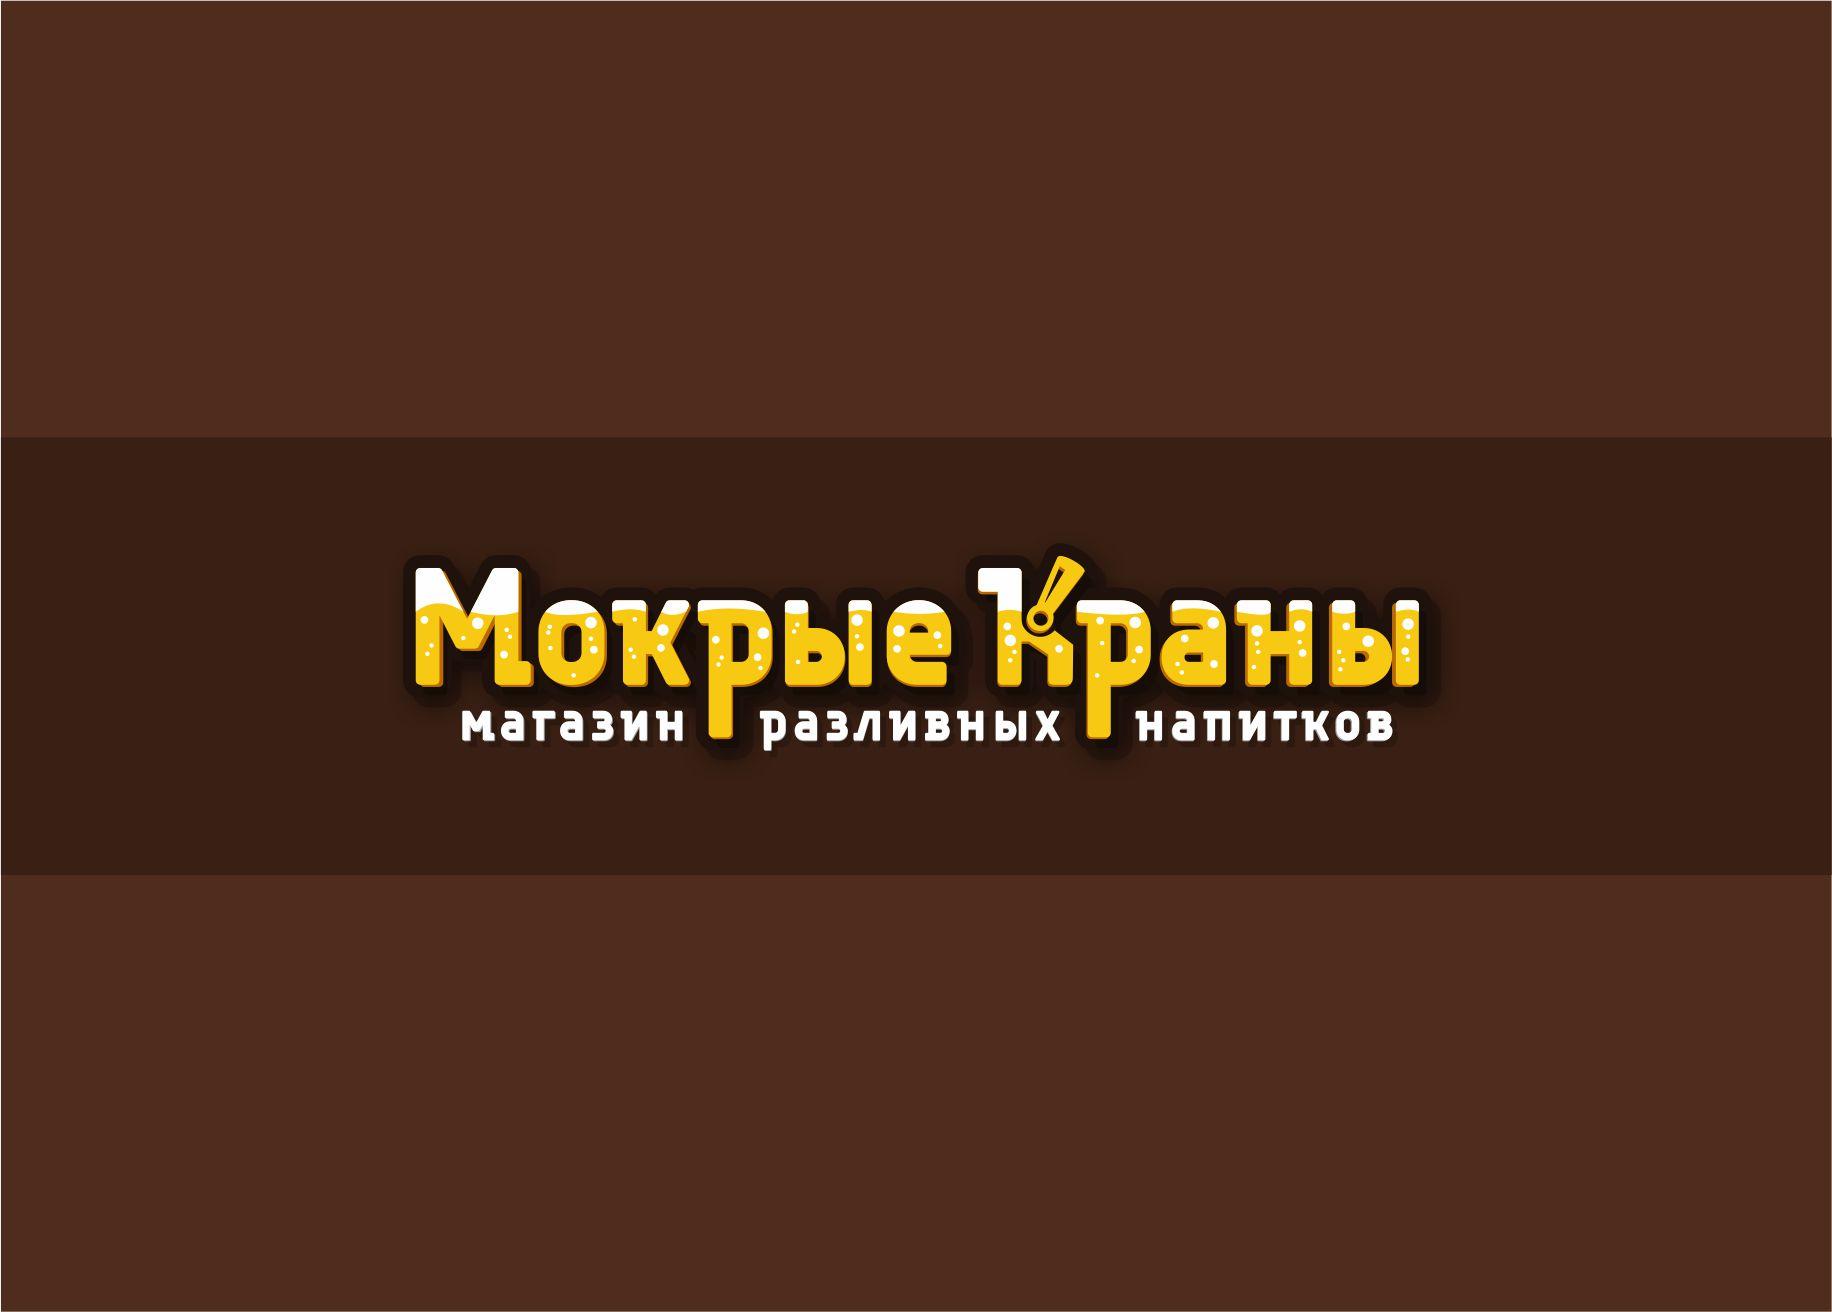 Вывеска/логотип для пивного магазина фото f_6916024e76a742b3.jpg